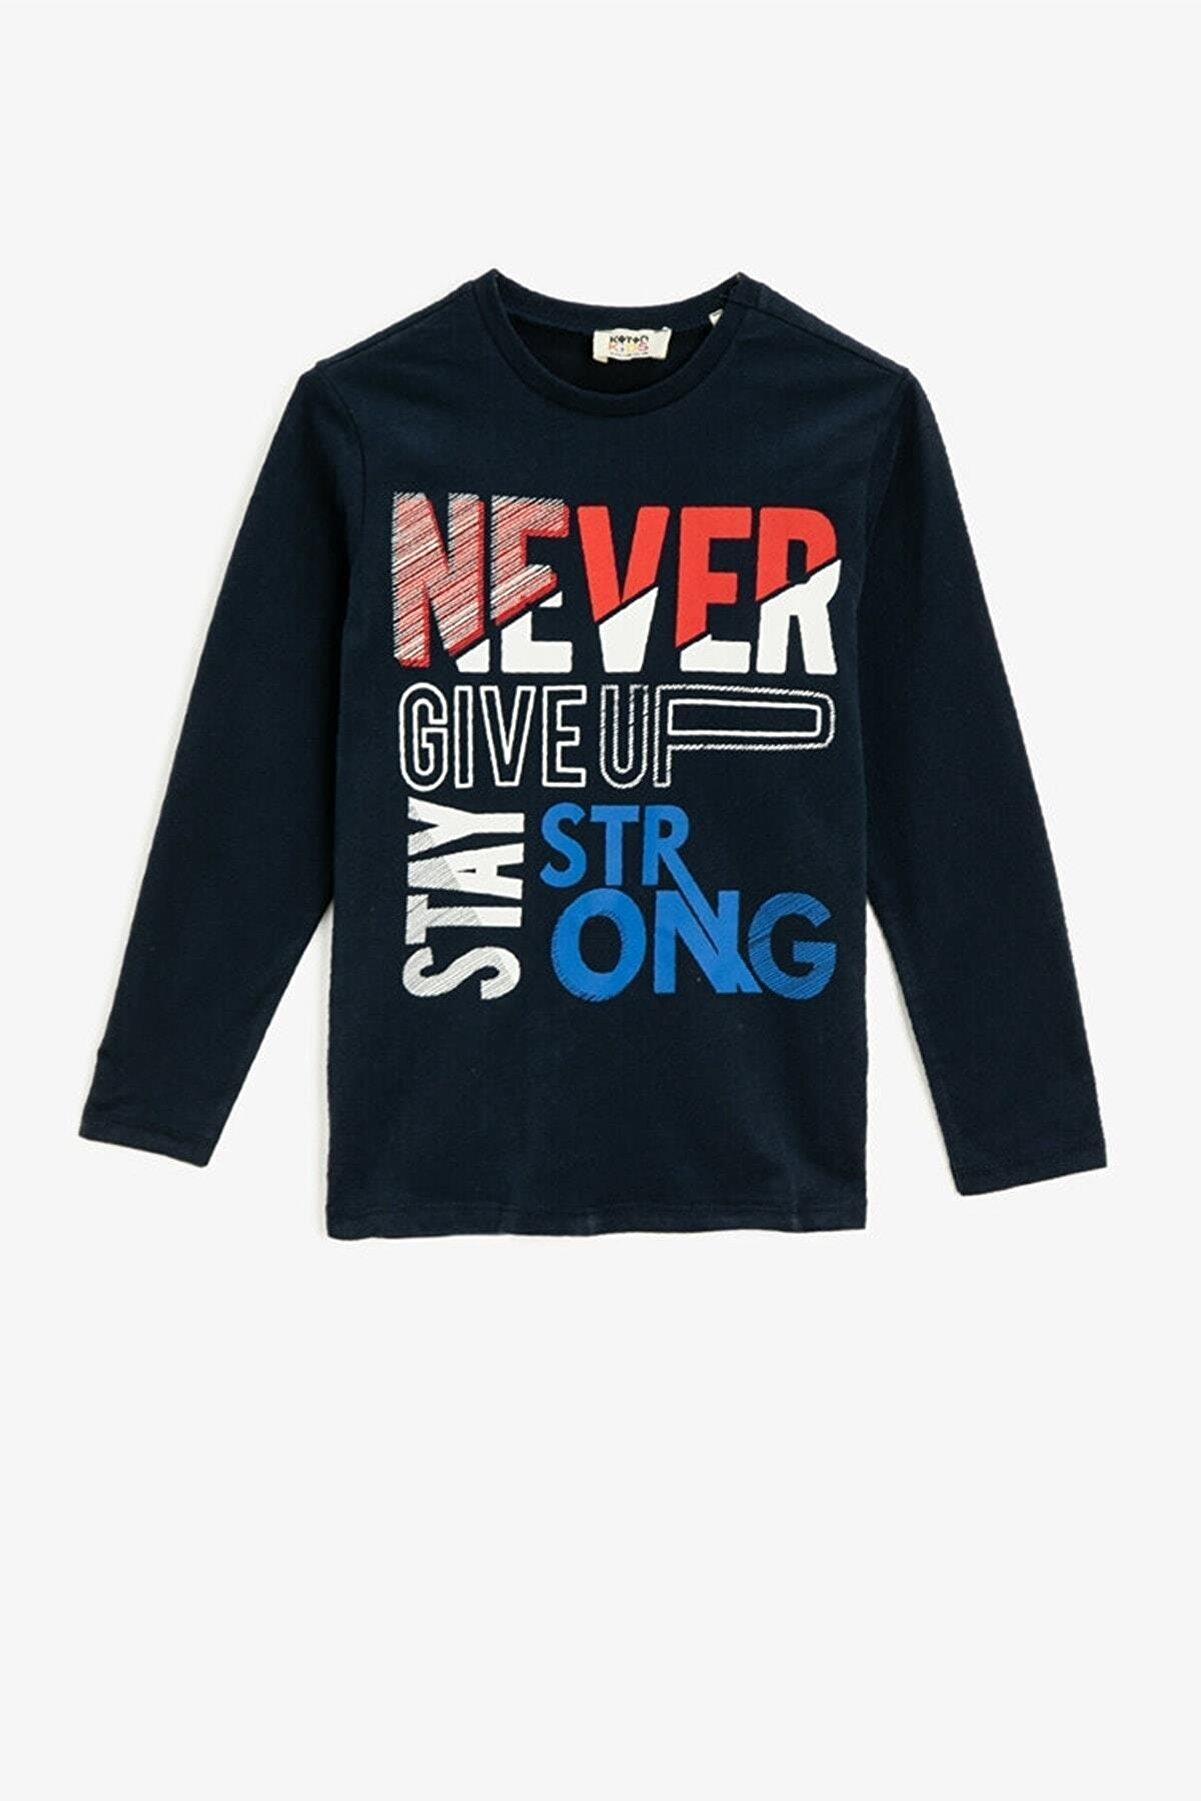 Koton Erkek Çocuk Lacivert Pamuklu Bisiklet Yaka Uzun Kollu T-shirt